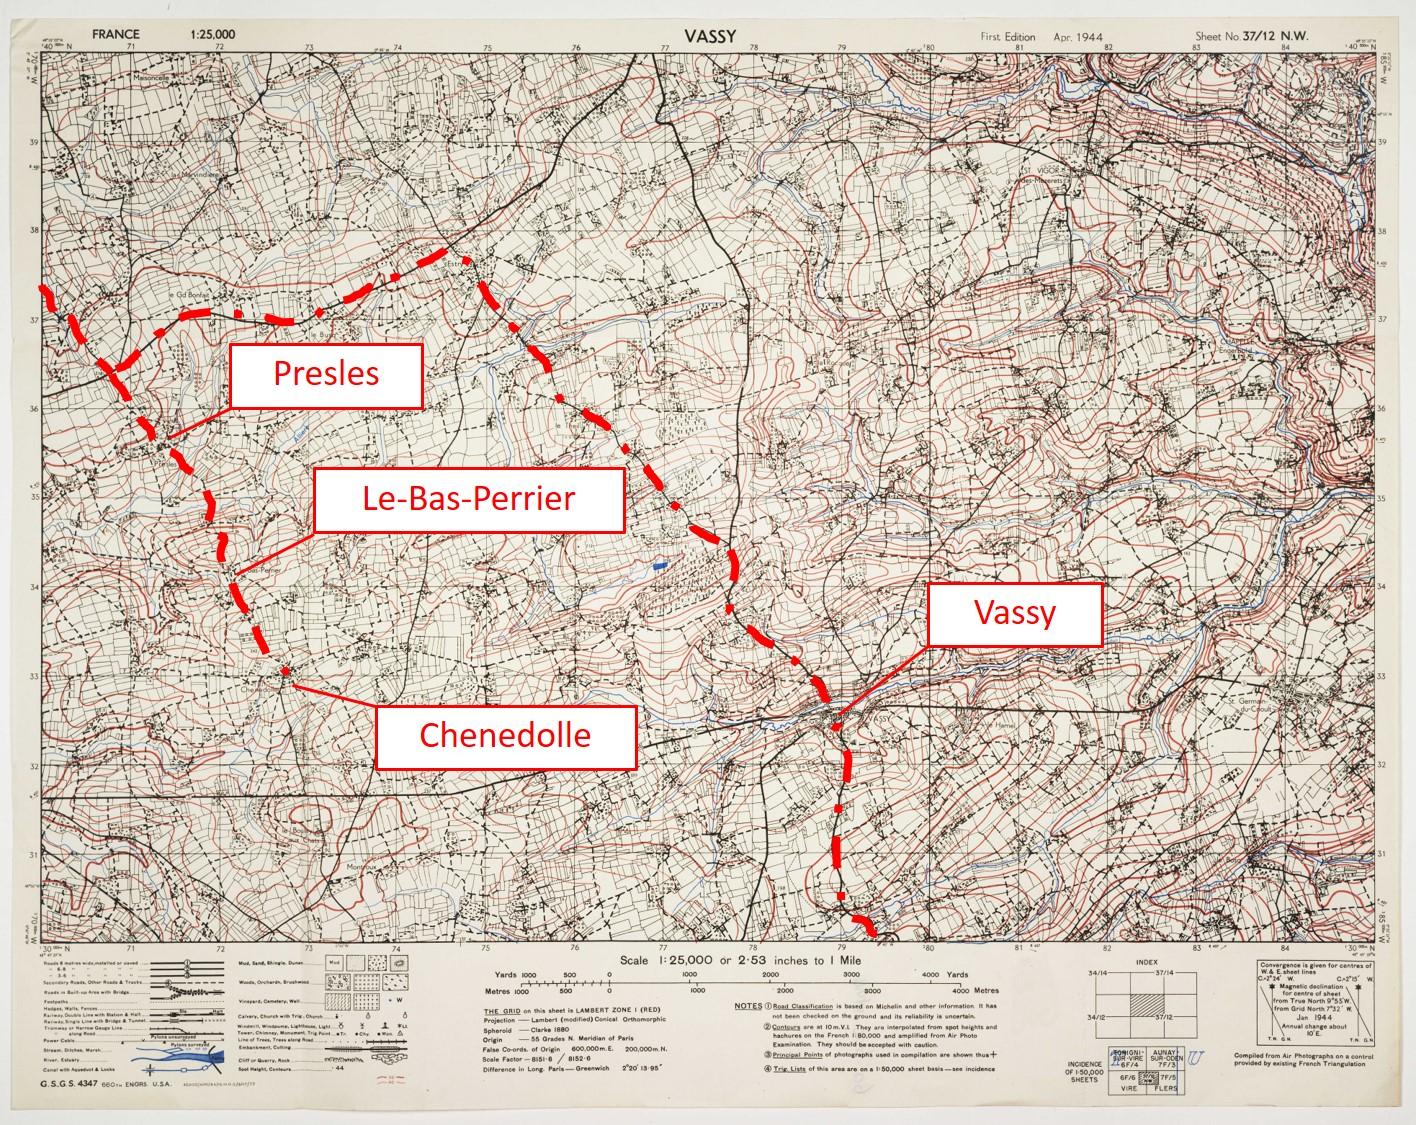 010B - GSGS-4347-Vassy-route